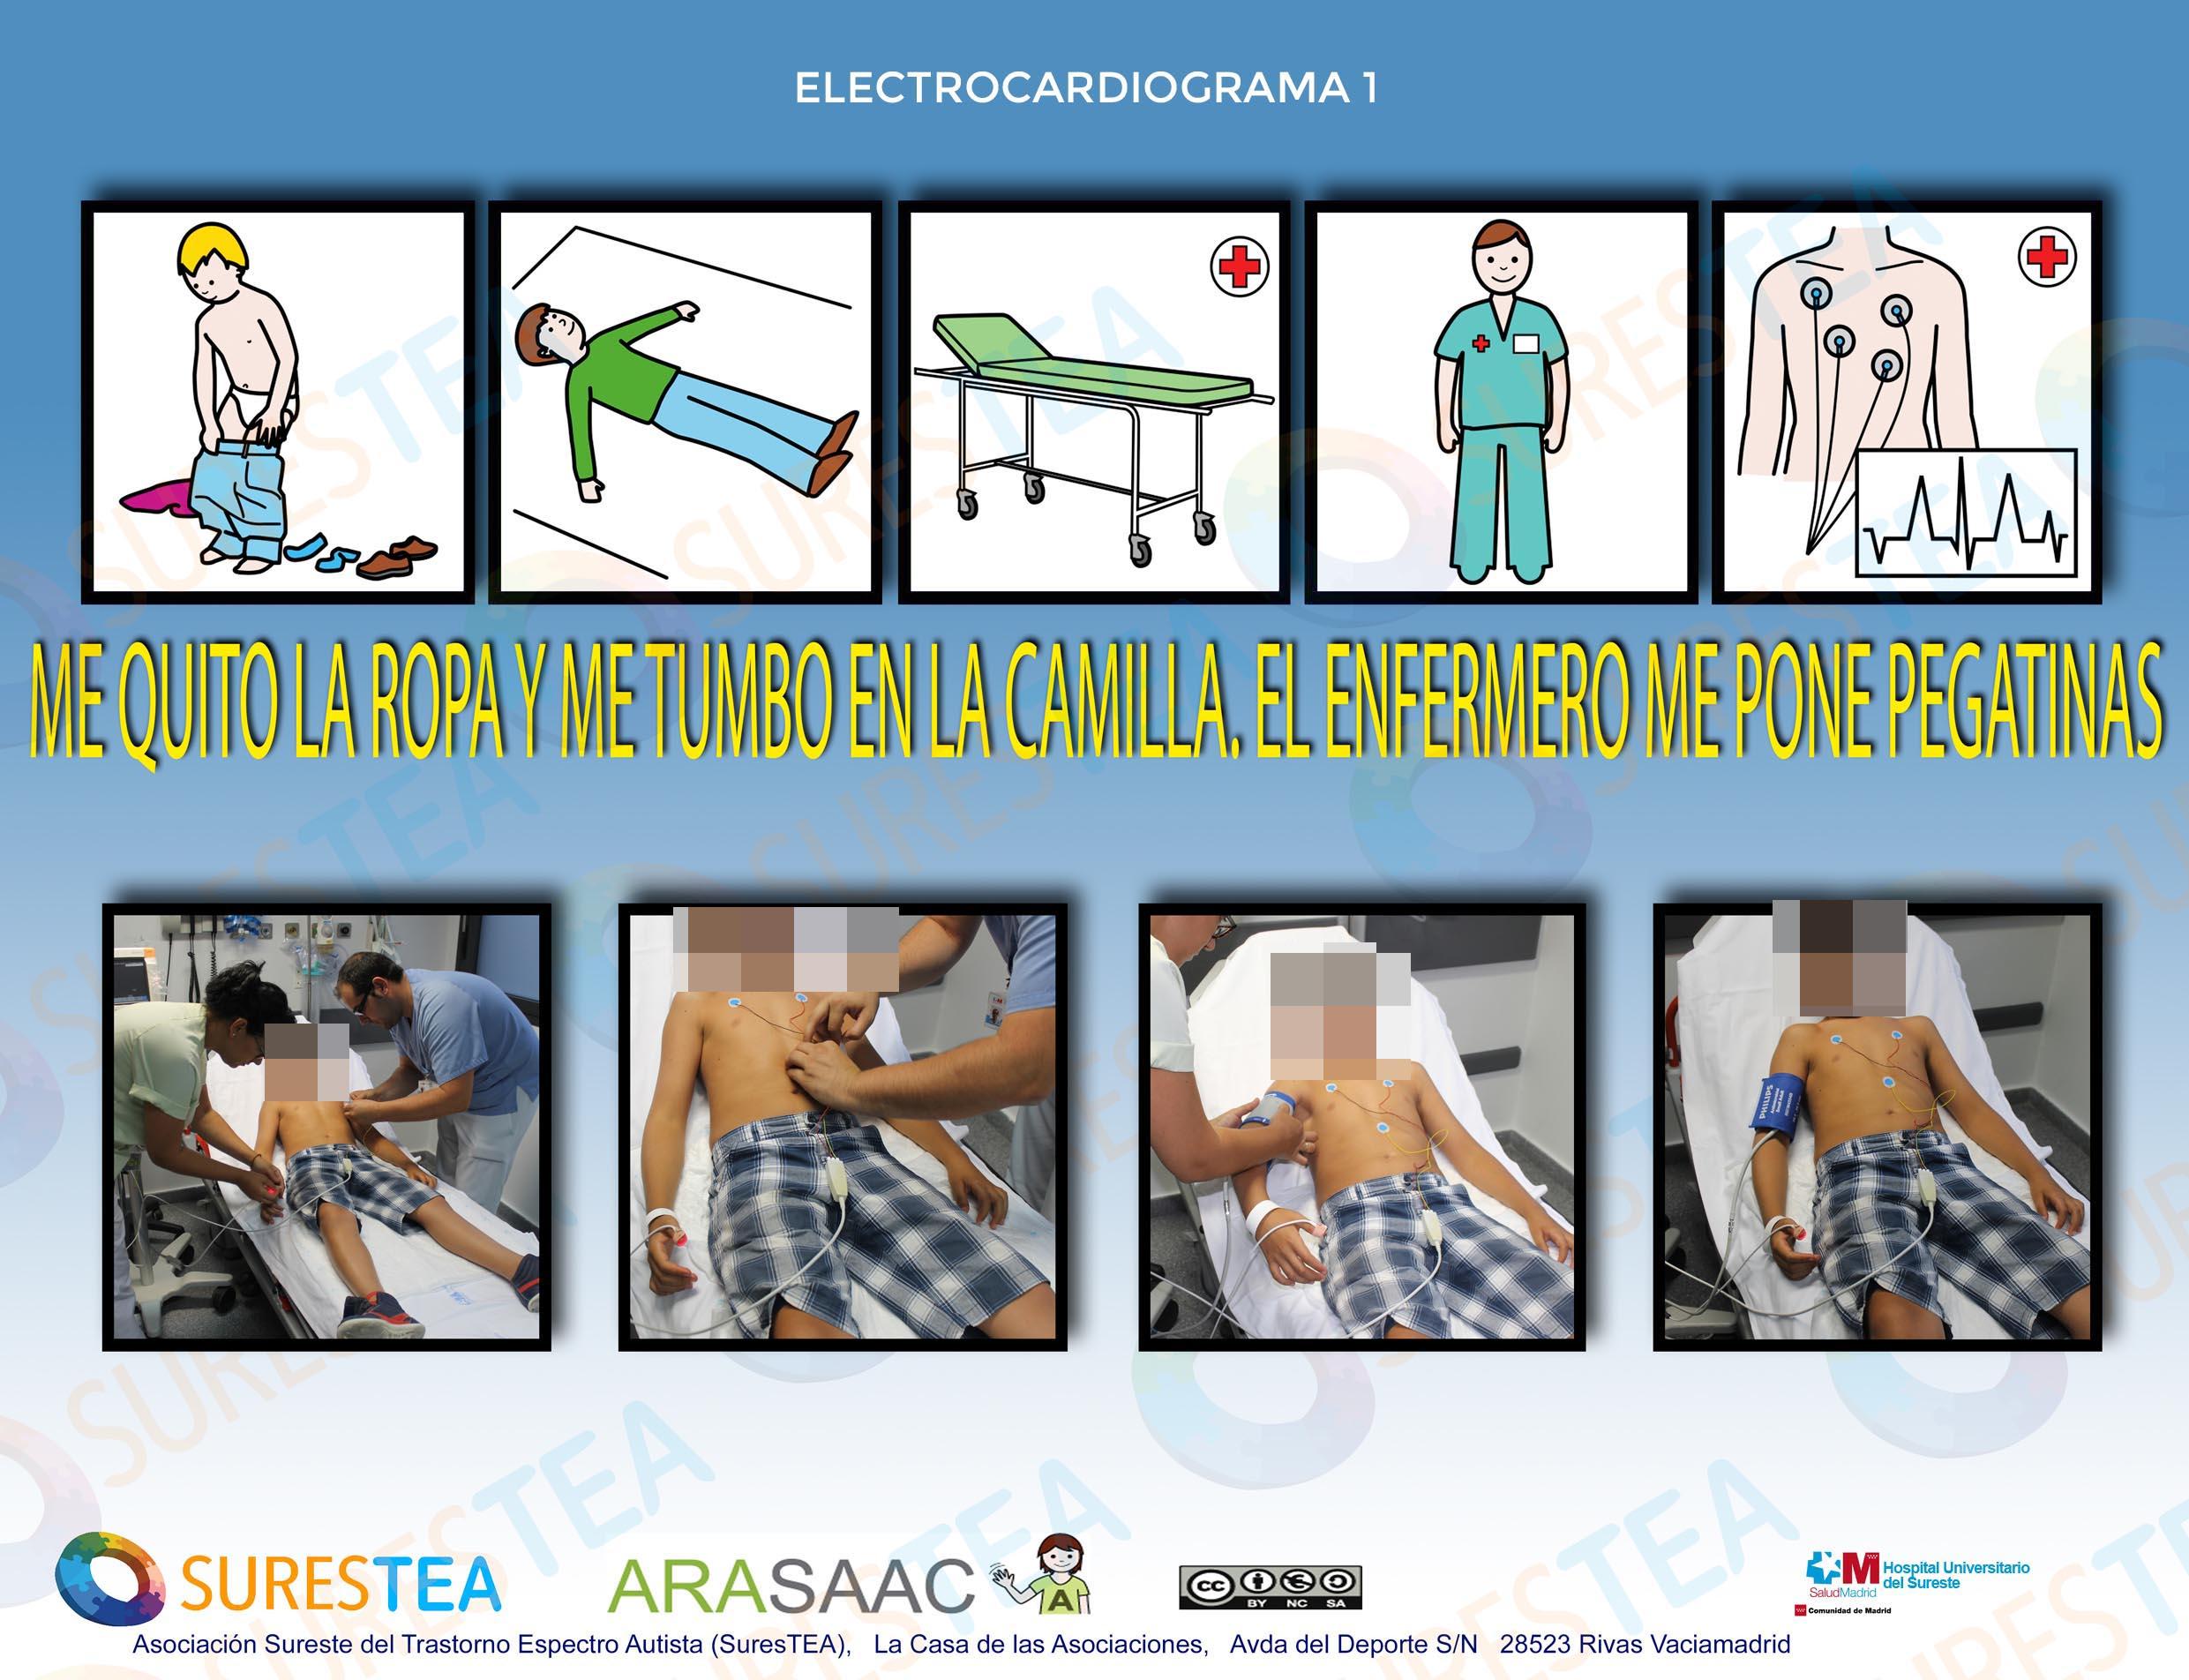 Electrocardiograma1